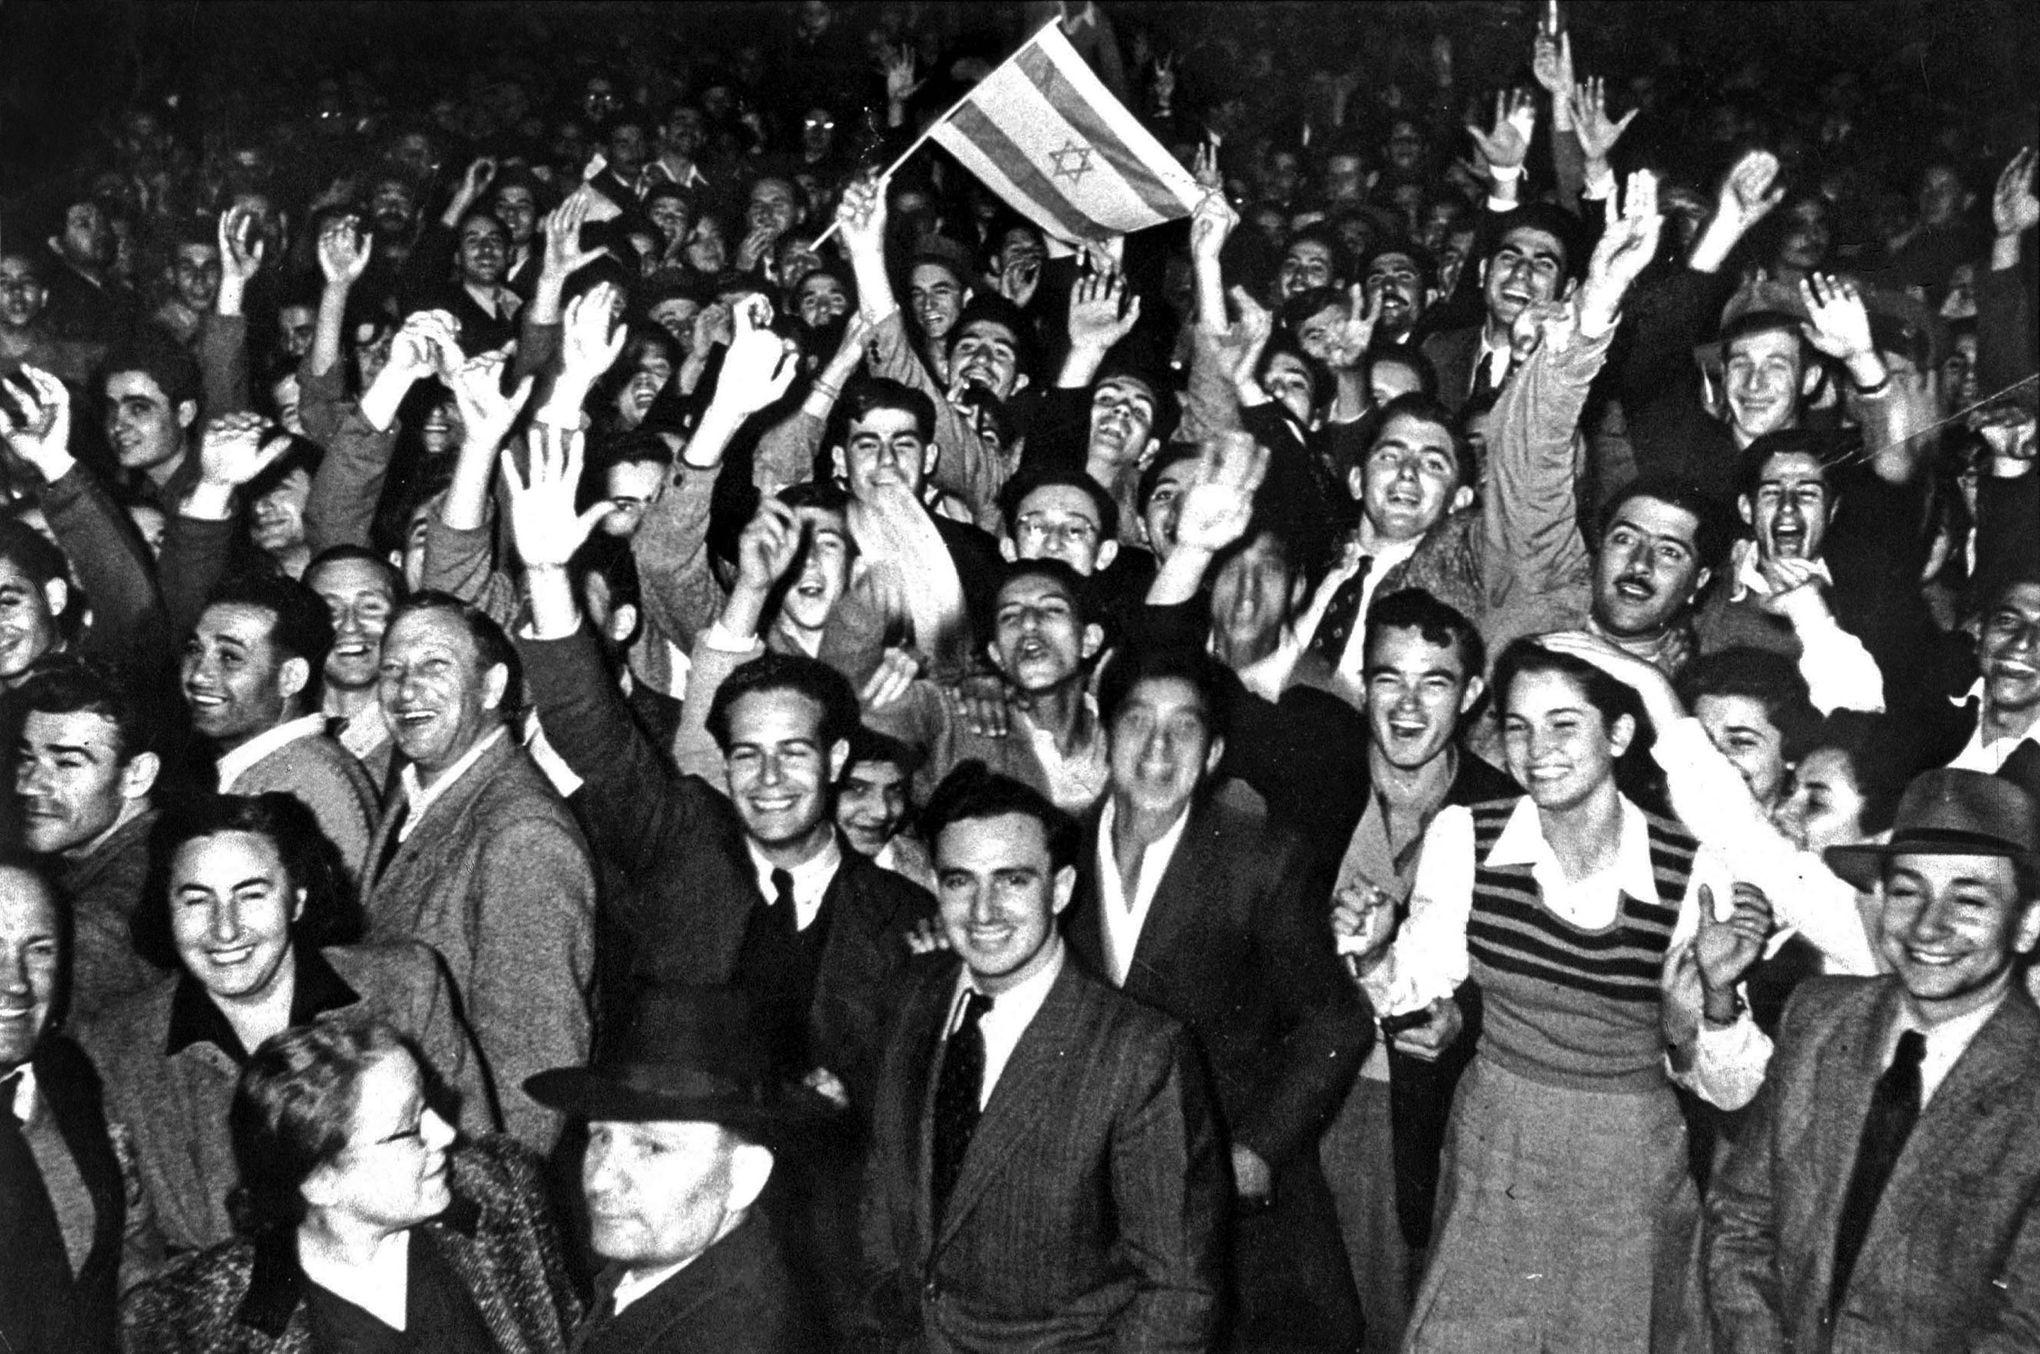 14 mai 1948 : naissance de l'État d'Israël